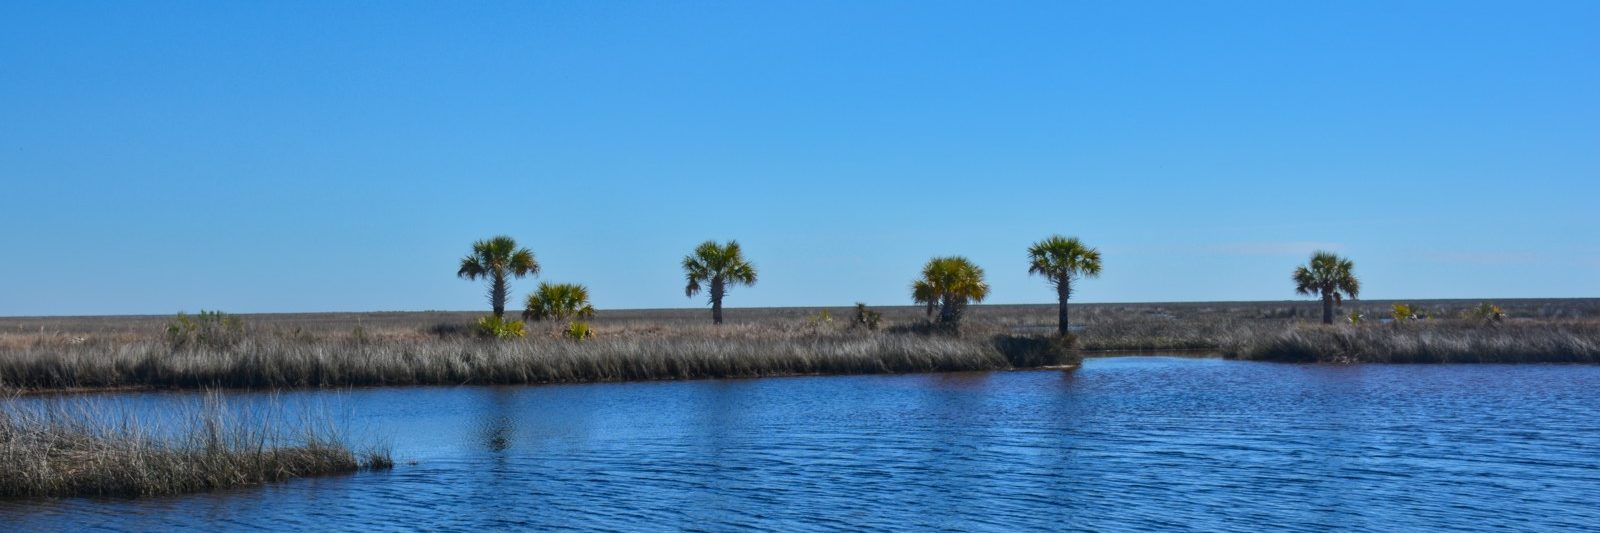 Florida Circumnavigational Trail St Marks